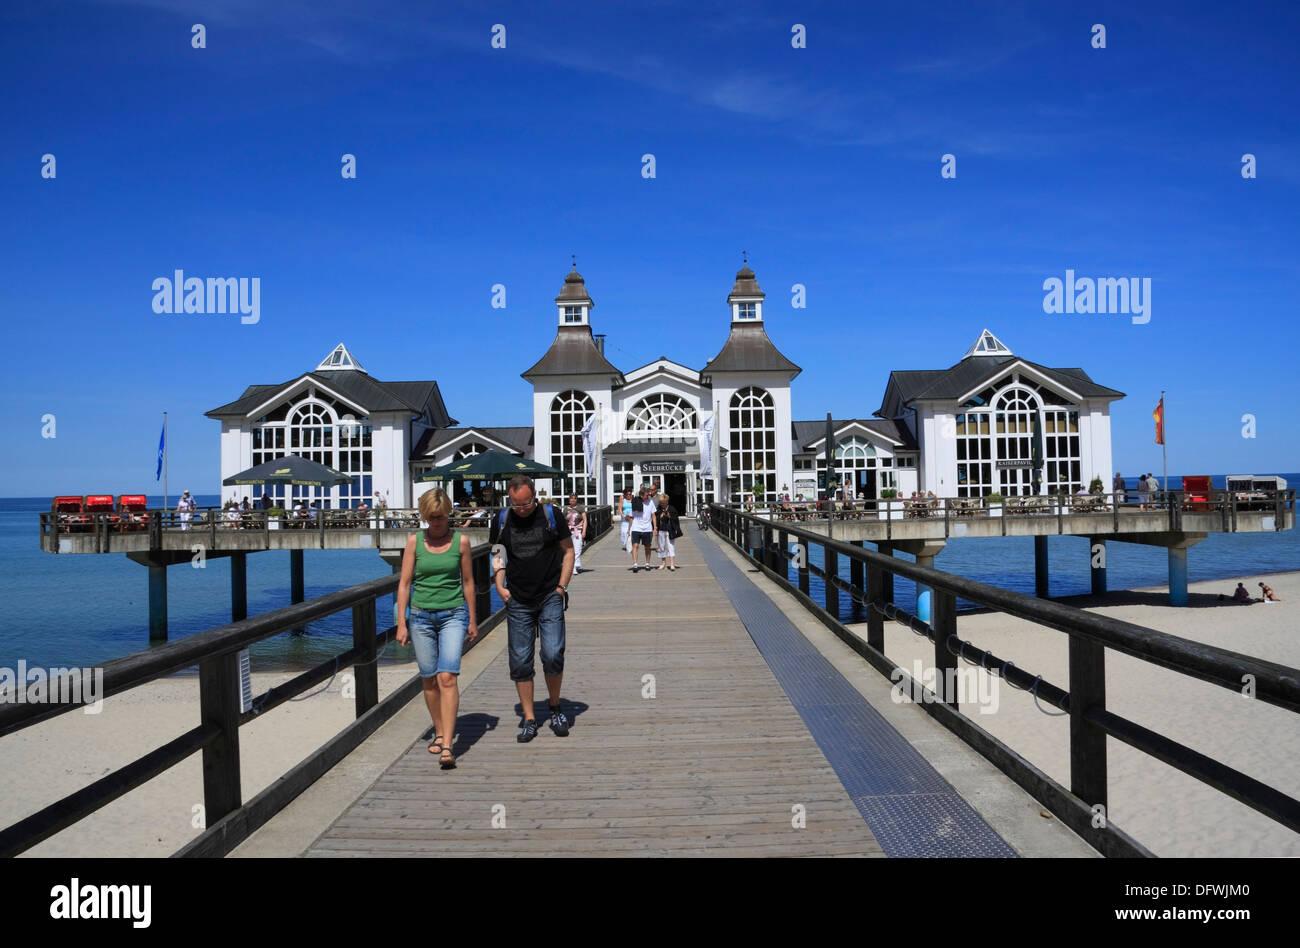 Sellin Pier, Ruegen Island, Baltic Sea Coast, Mecklenburg-Western Pomerania, Germany Stock Photo